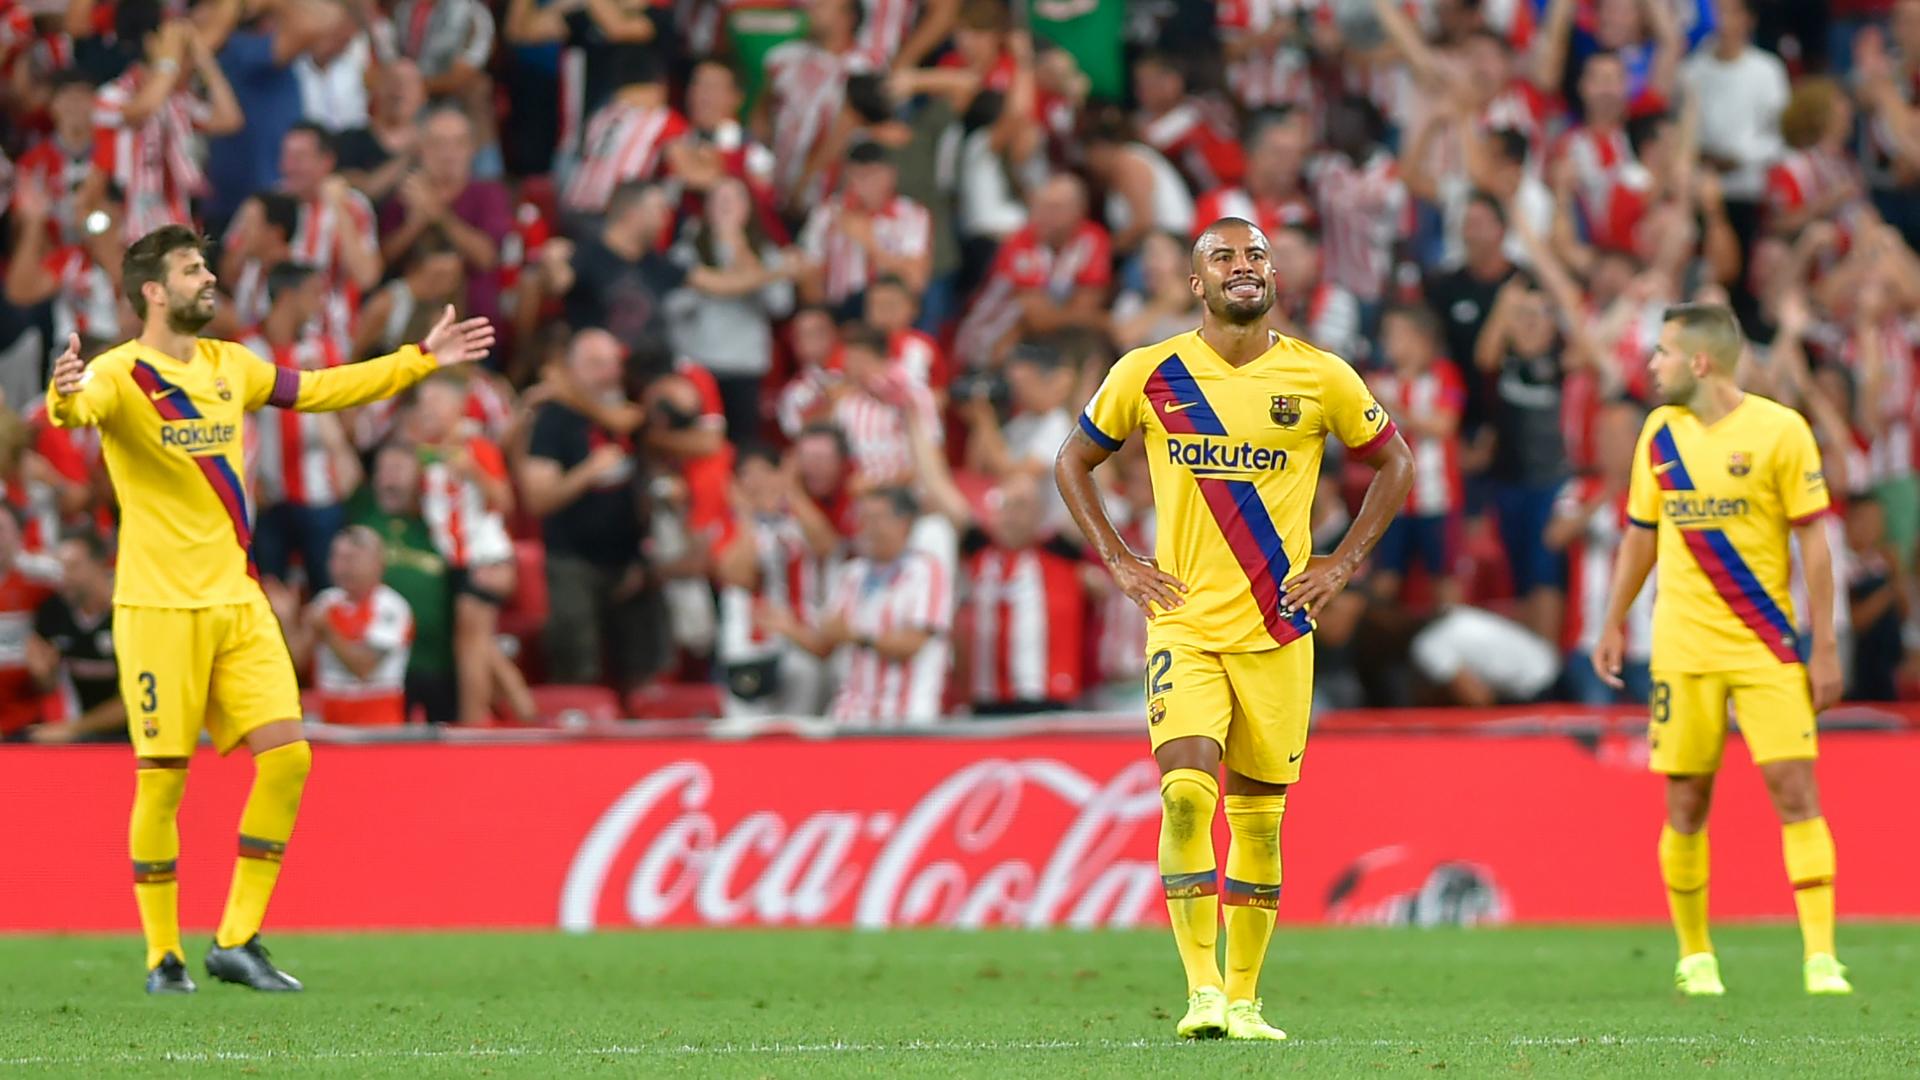 Neymar! Neymar! Neymar! Brazil star on Barca minds after disaster in Bilbao